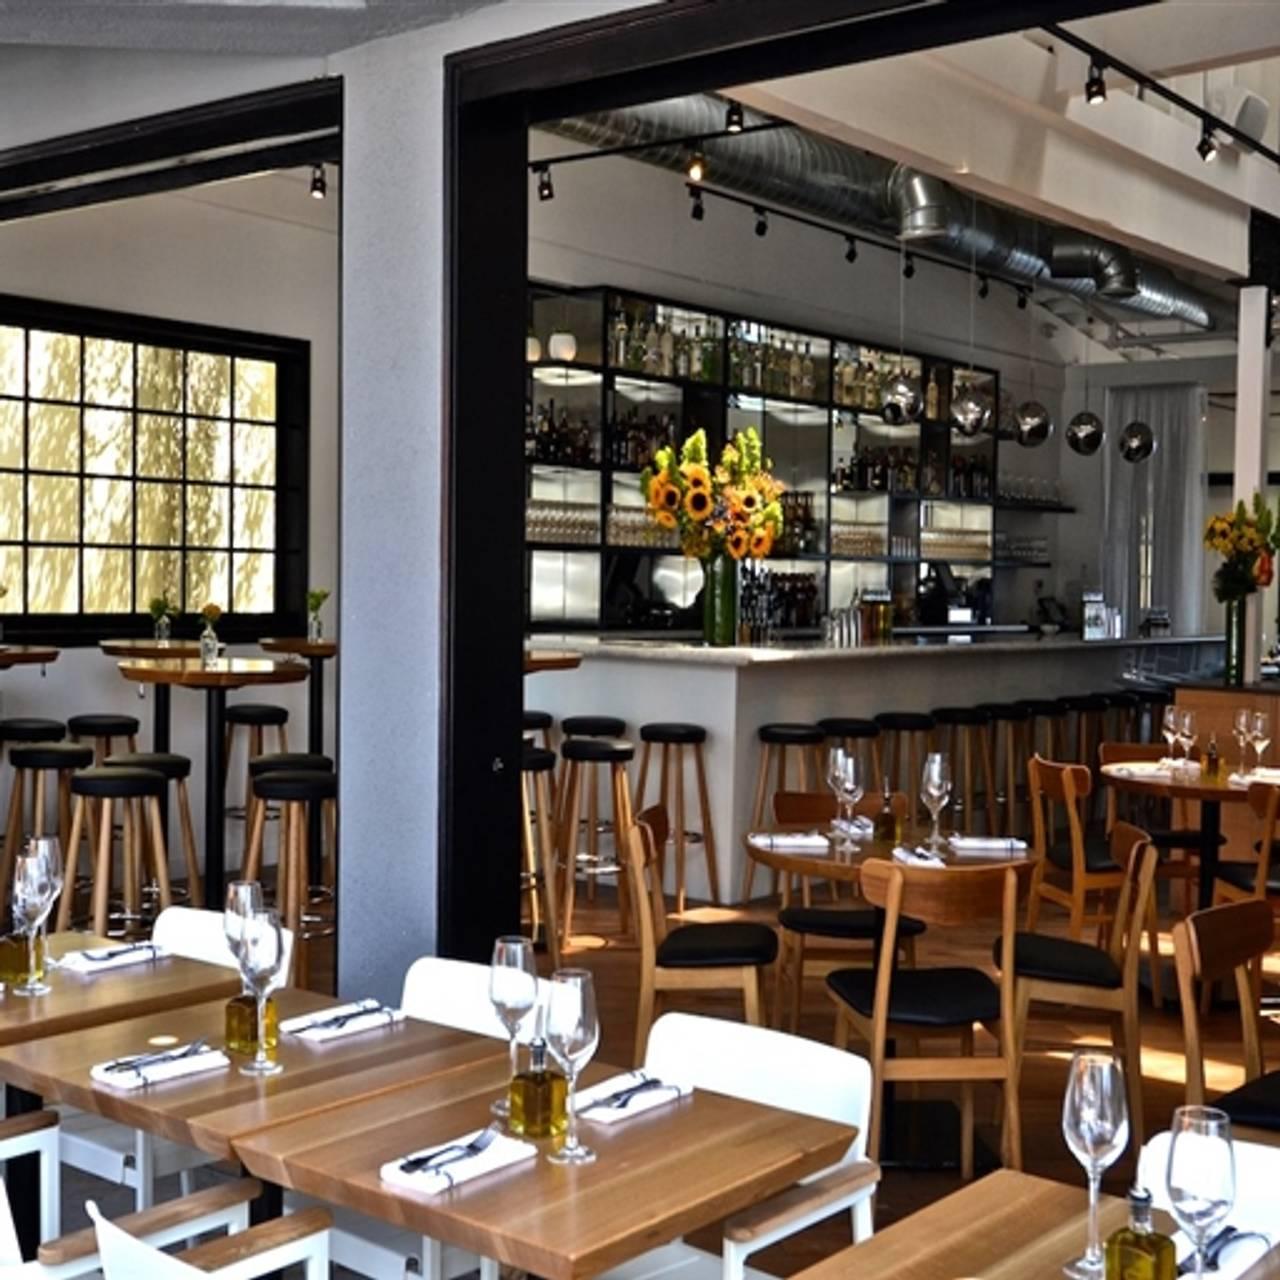 Obica Mozzarella Bar Pizza E Cucina Santa Monica